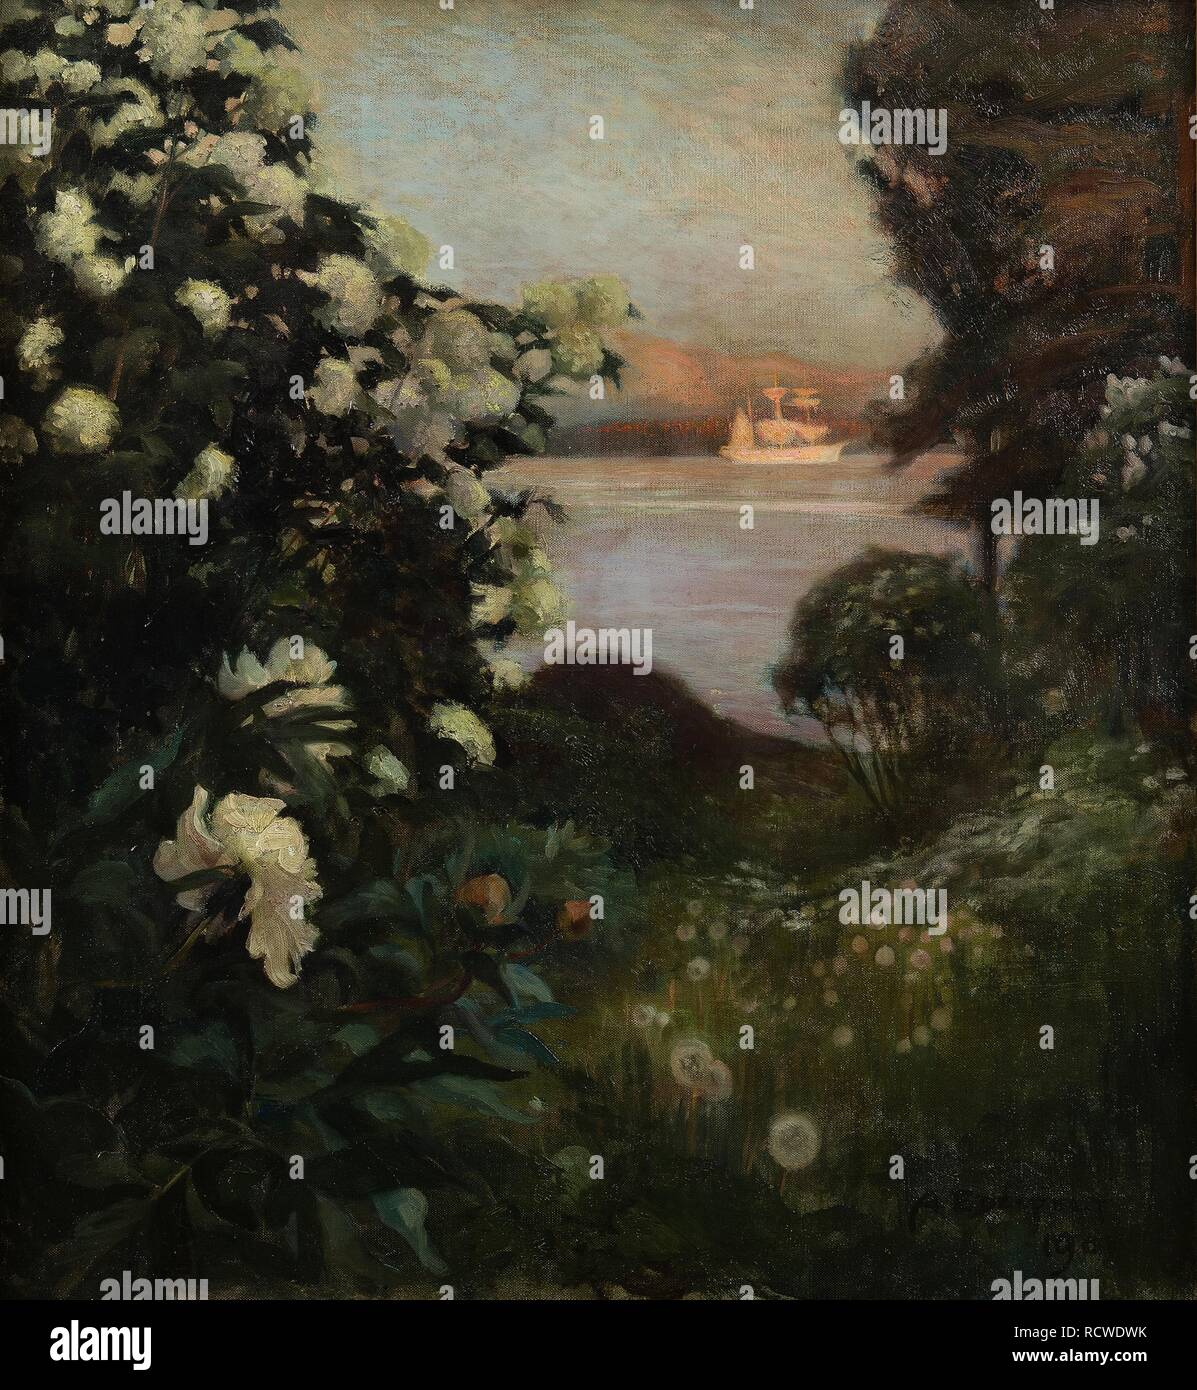 Blühende Bäume, haikon. Museum: private Sammlung. Autor: Albert Edelfelt, Gustaf Aristides. Stockfoto